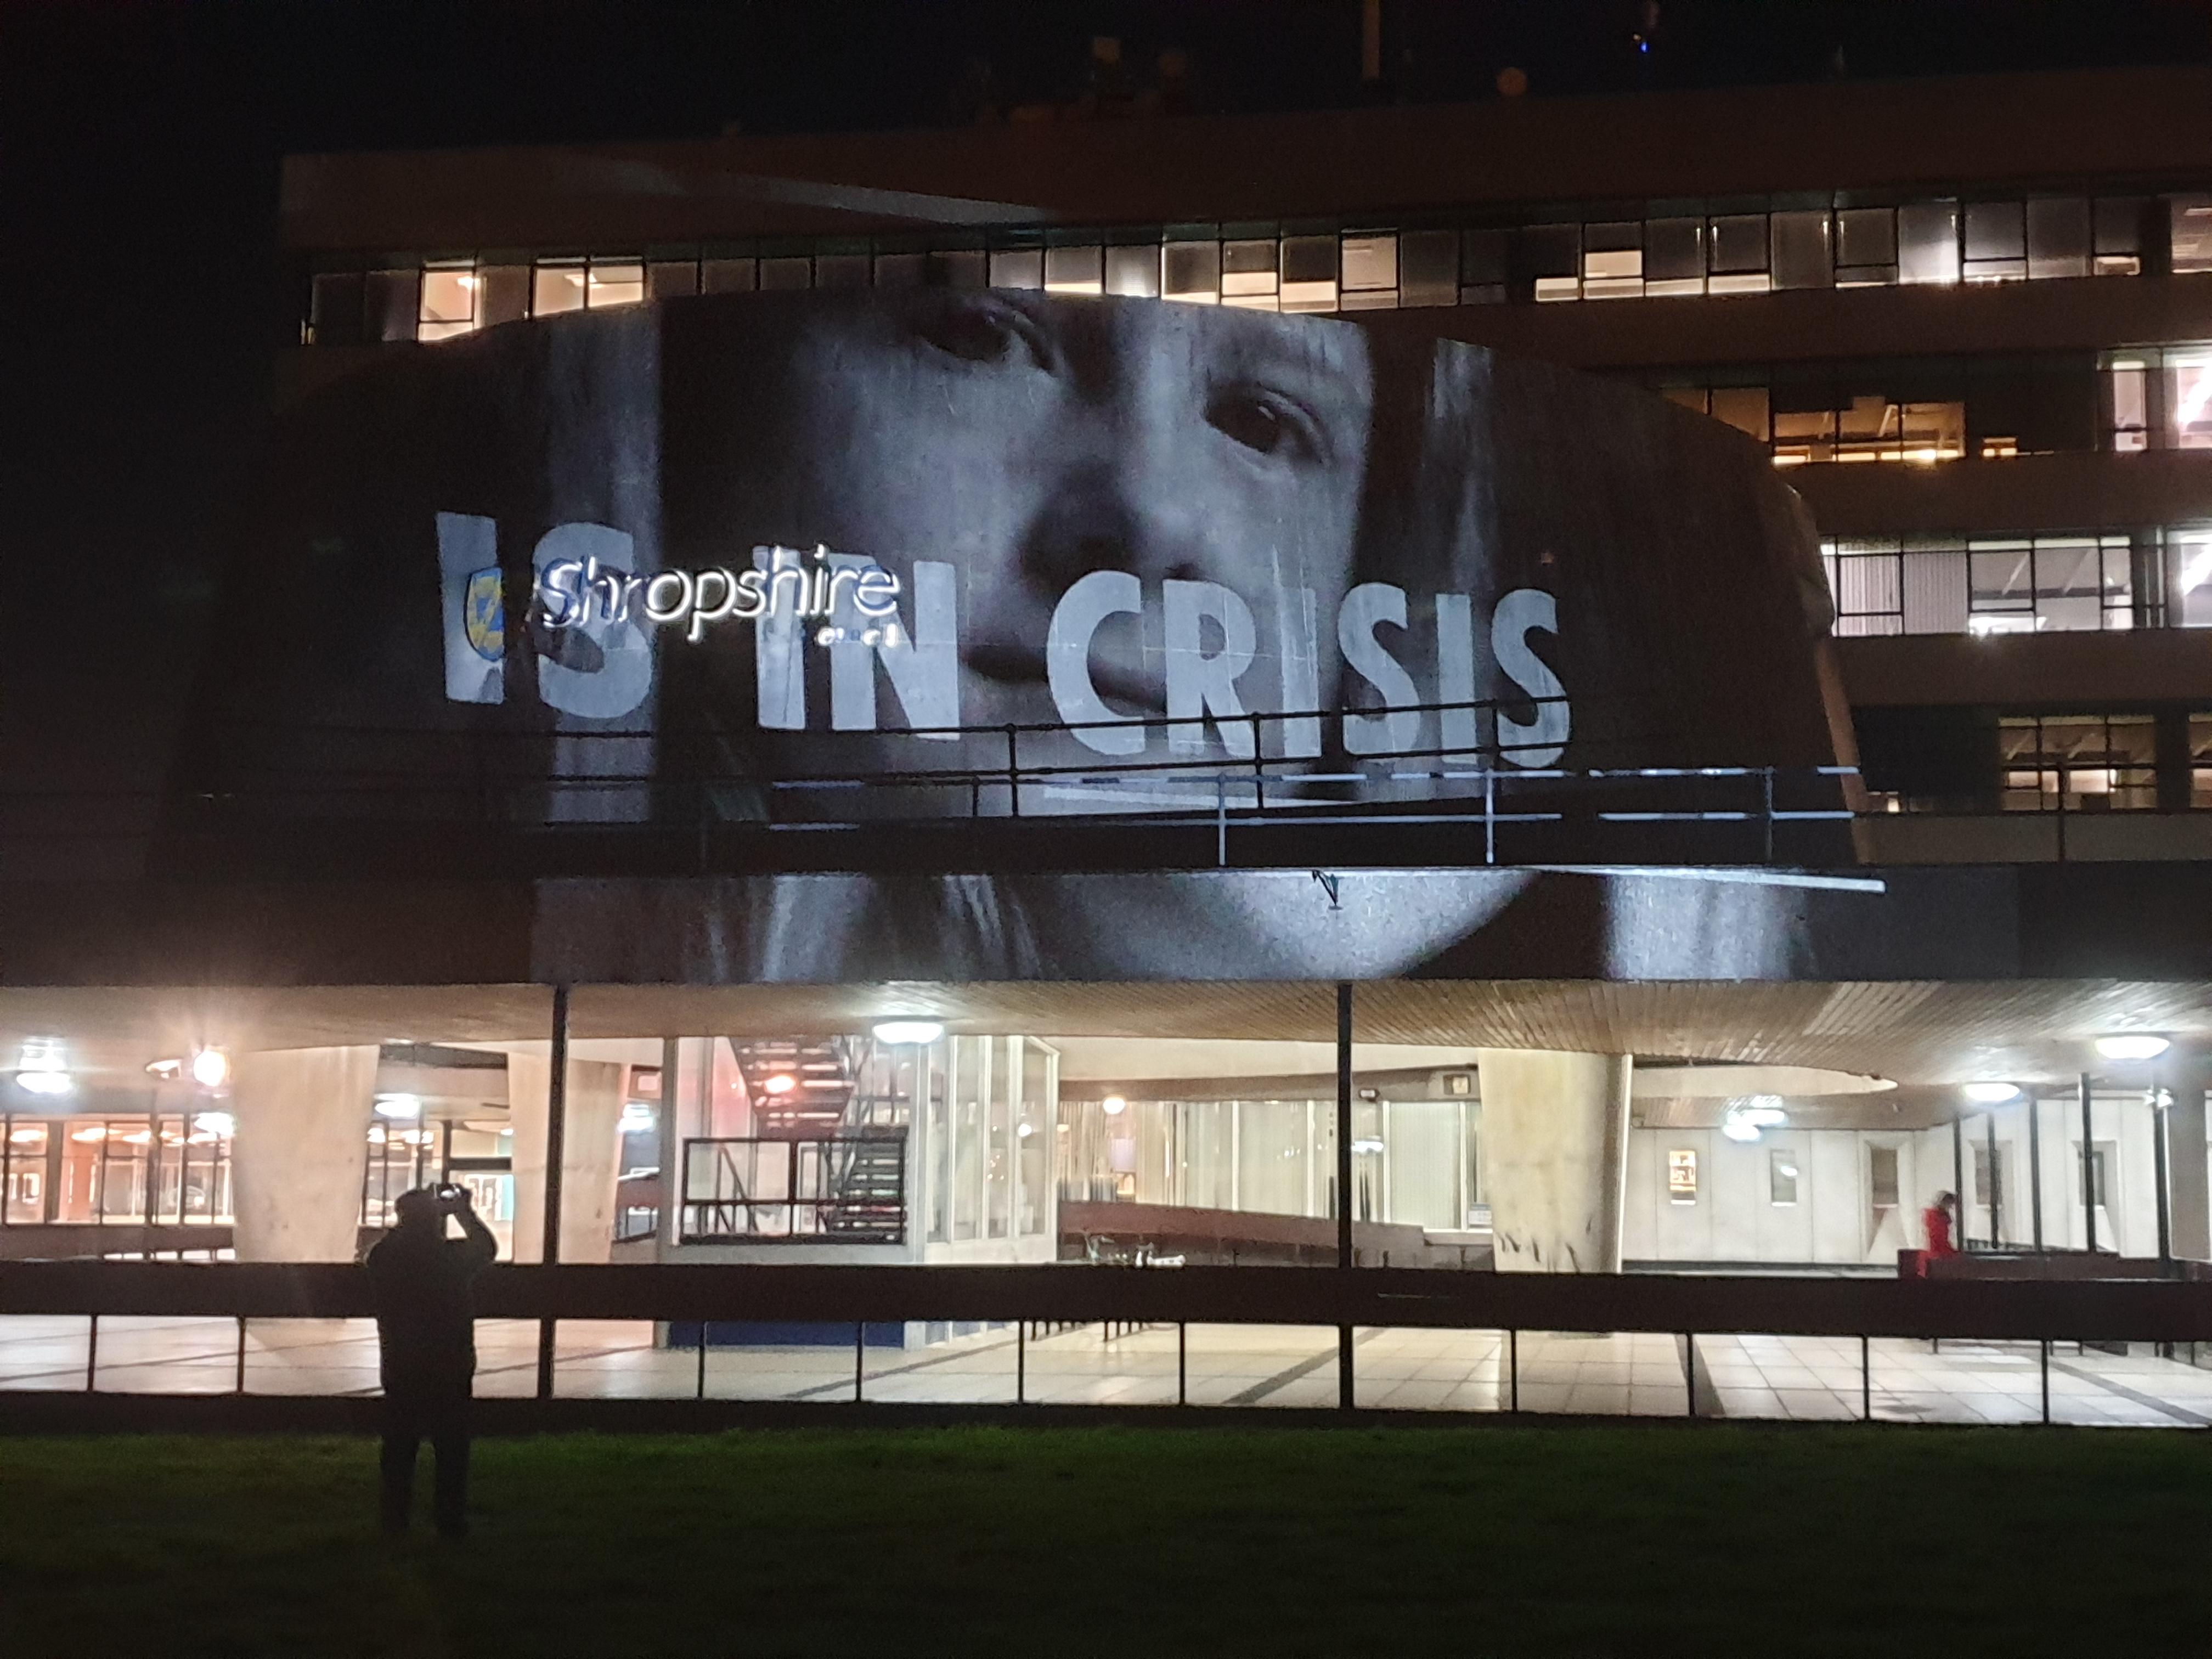 Activists project climate change film onto Shropshire Council headquarters